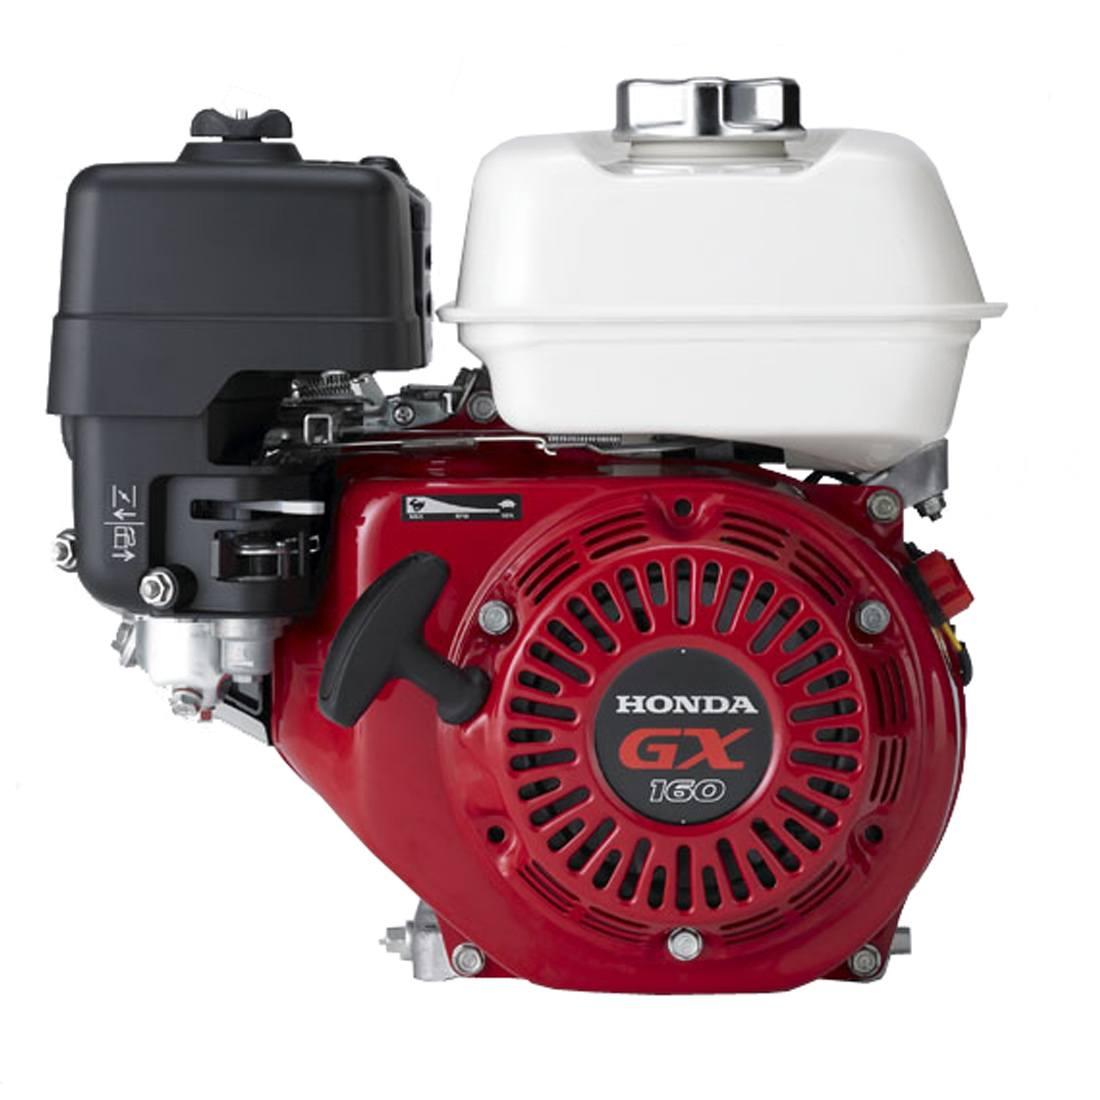 GX160UT2-RHQ4. Двигатель бензиновый Honda GX 160 RHQ4